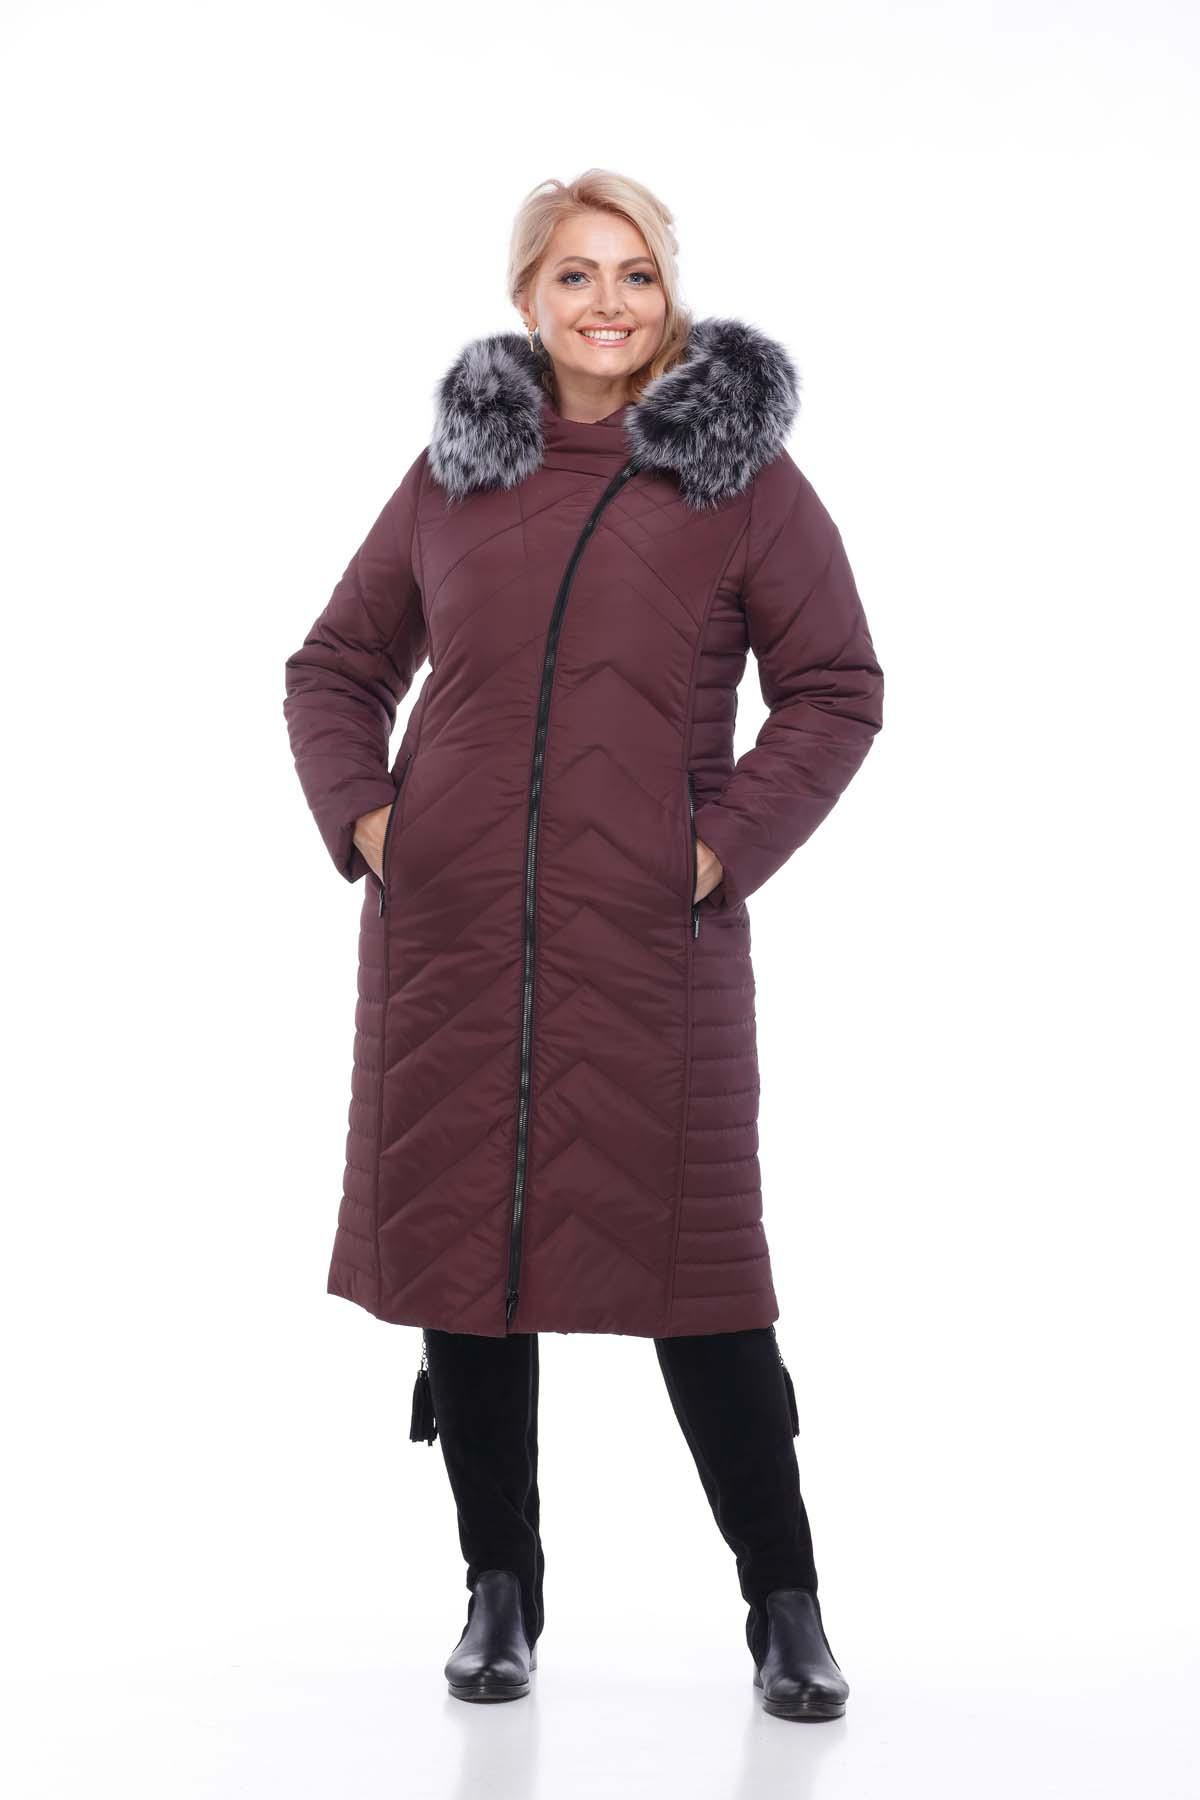 Зимове пальто Міра песець двукольоровий марсала